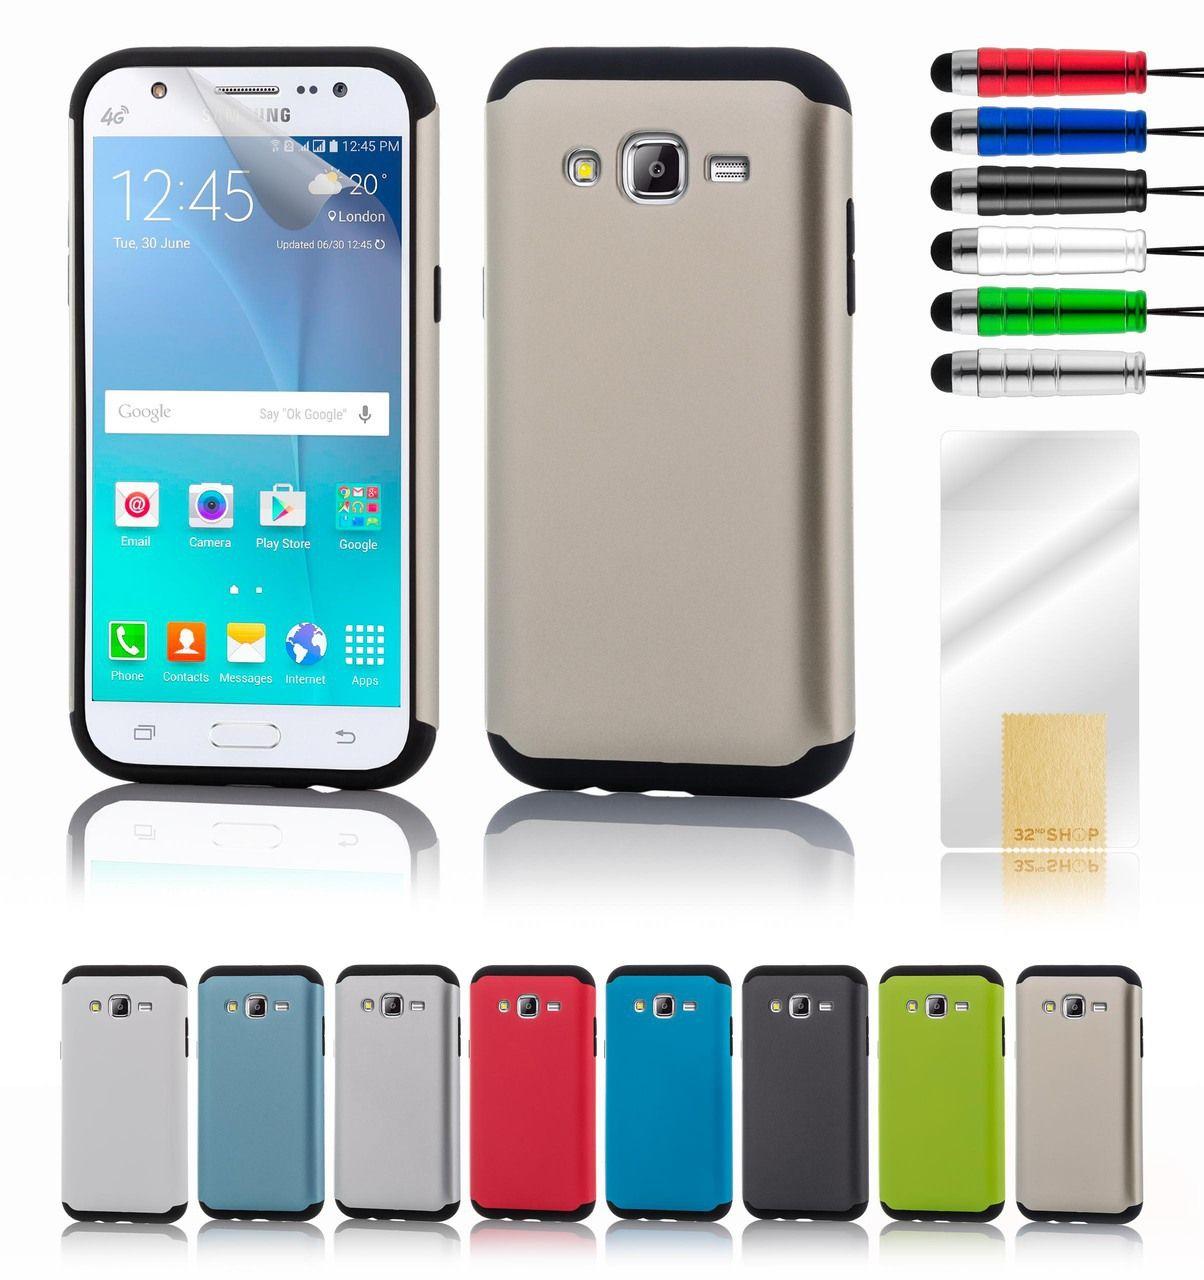 Samsung Galaxy J5 (2015) Slim Armour Shockproof Case - 32ndShop